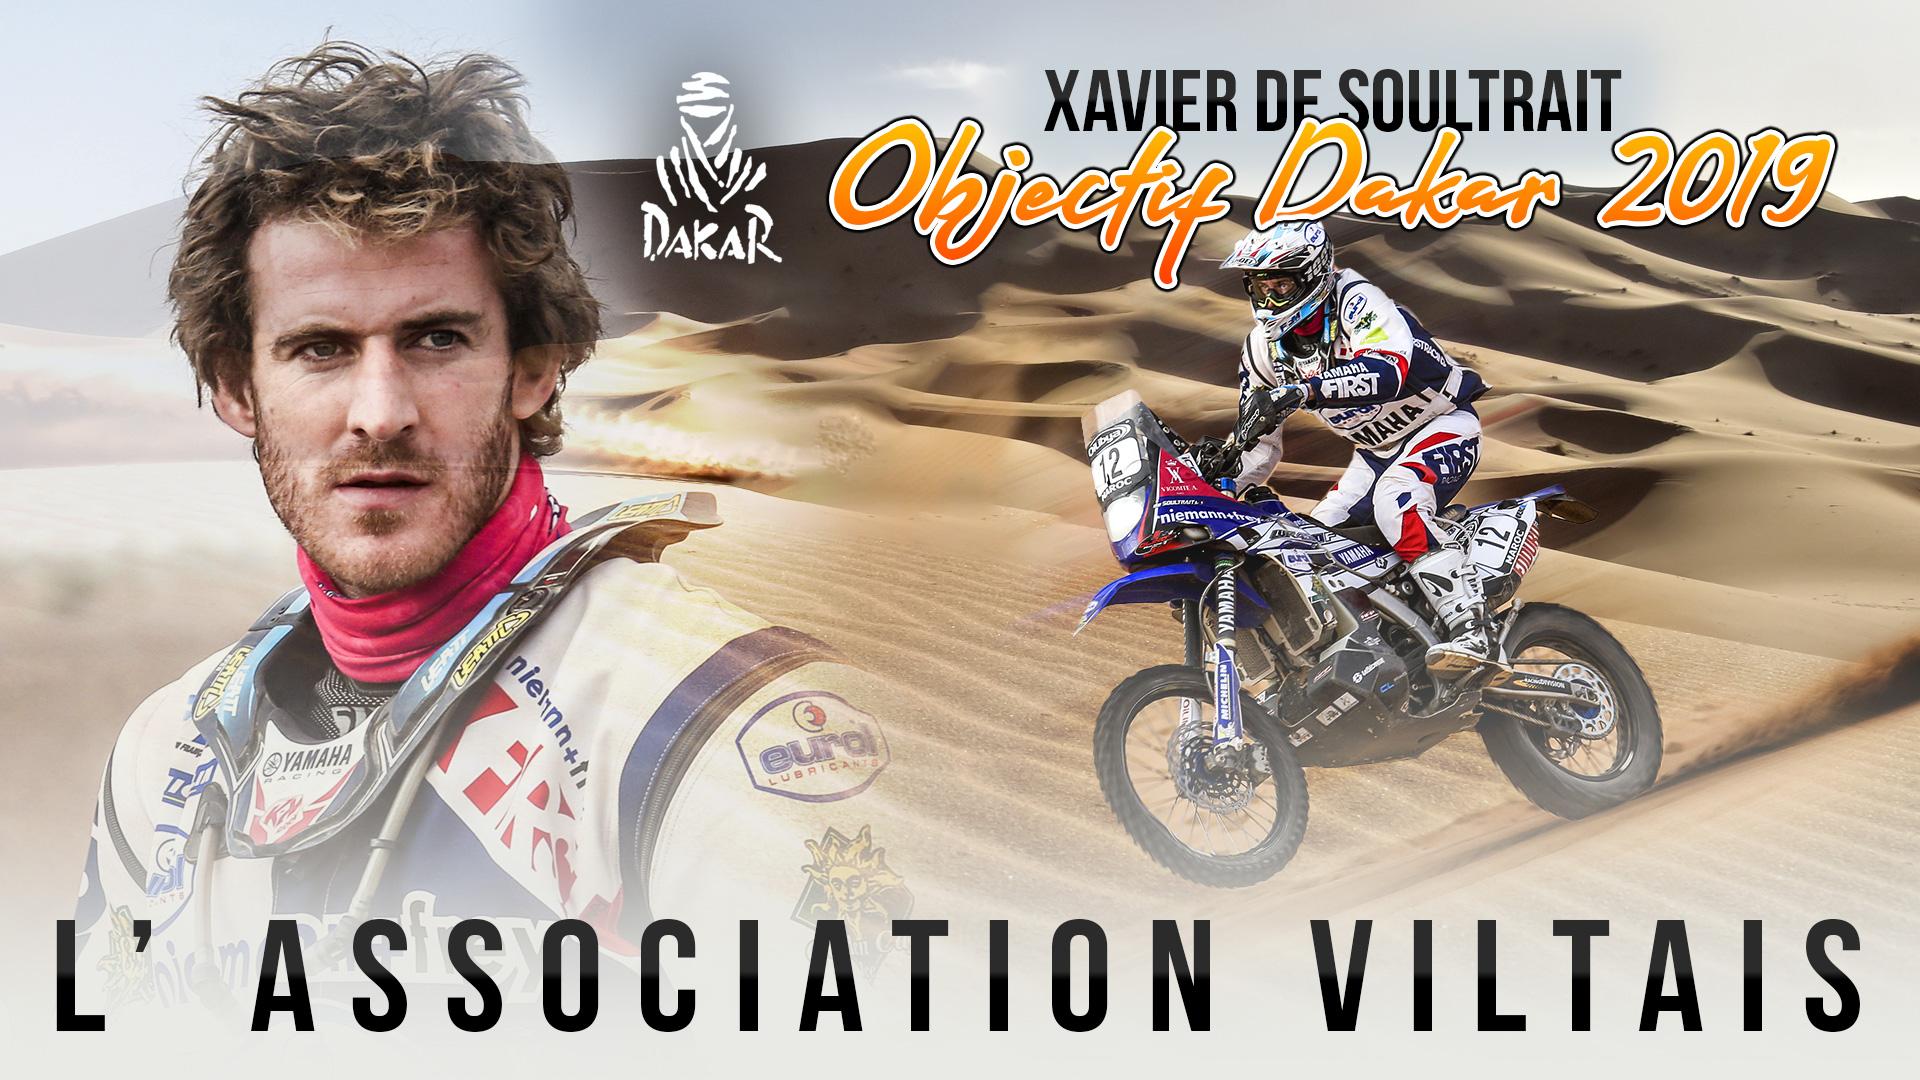 Objectif Dakar 2019 avec Xavier de Soultrait - association Viltaïs